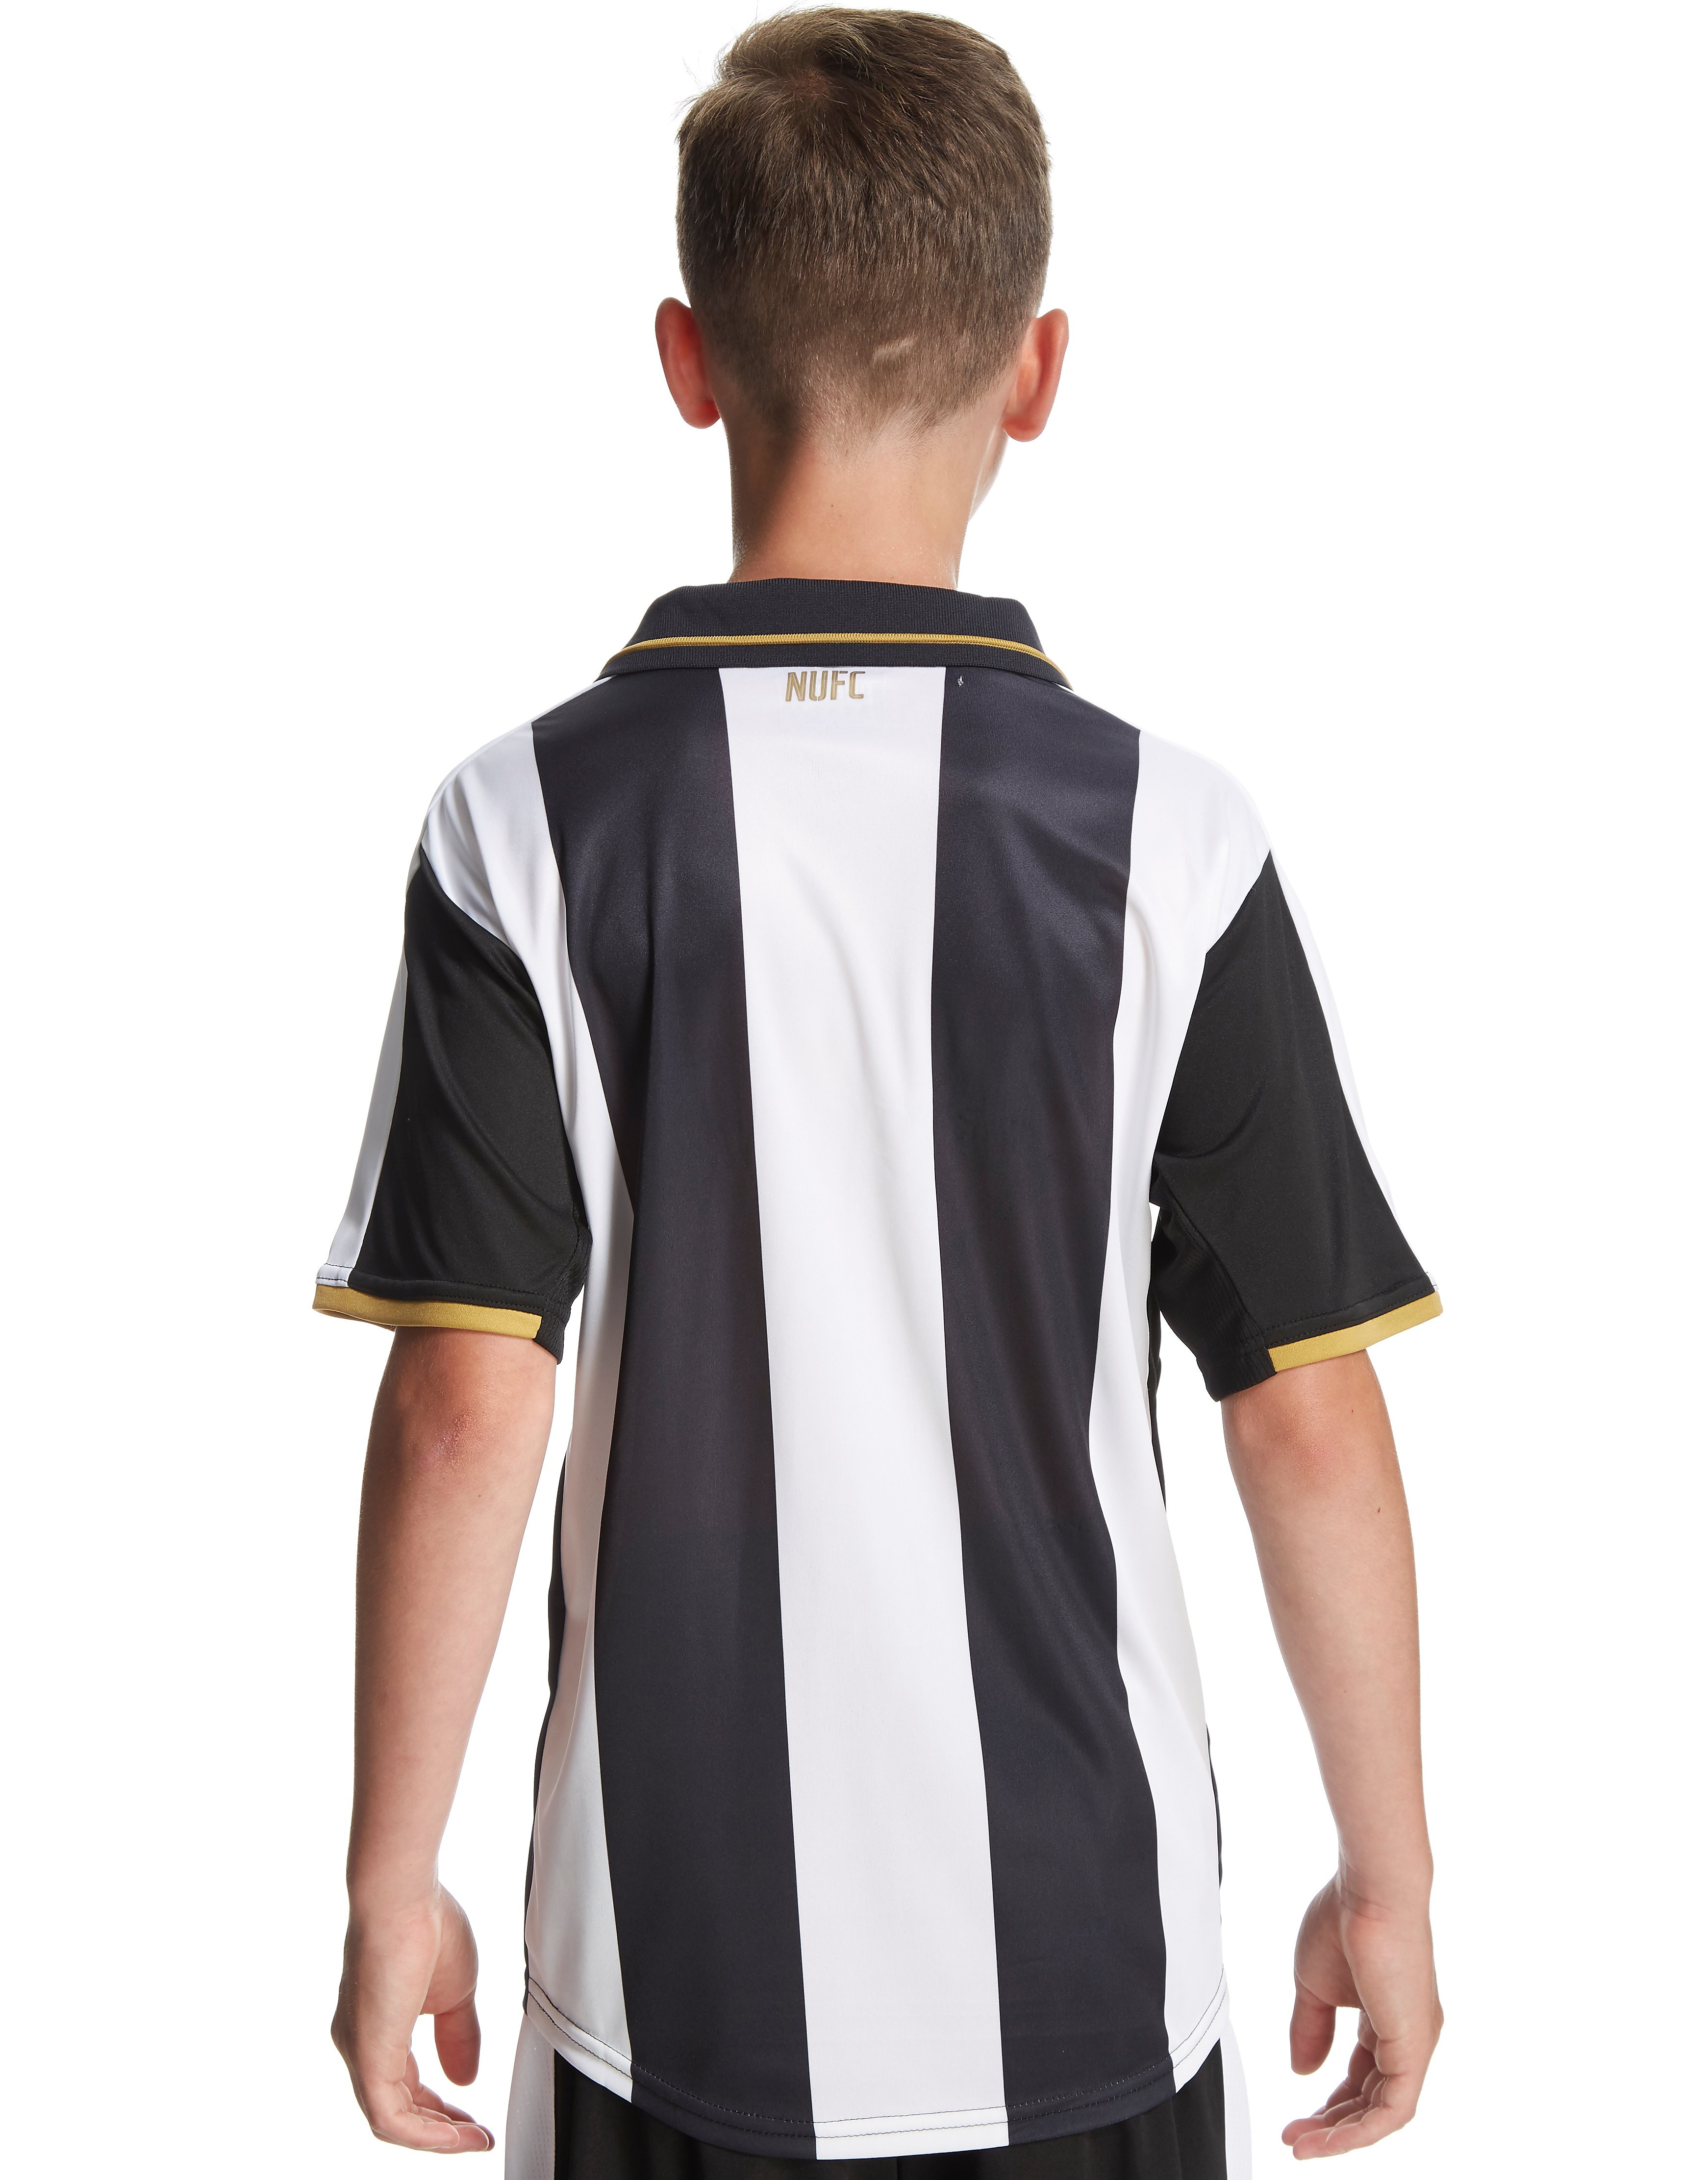 PUMA Newcastle United FC 2016/17 hjemmebanetrøje junior